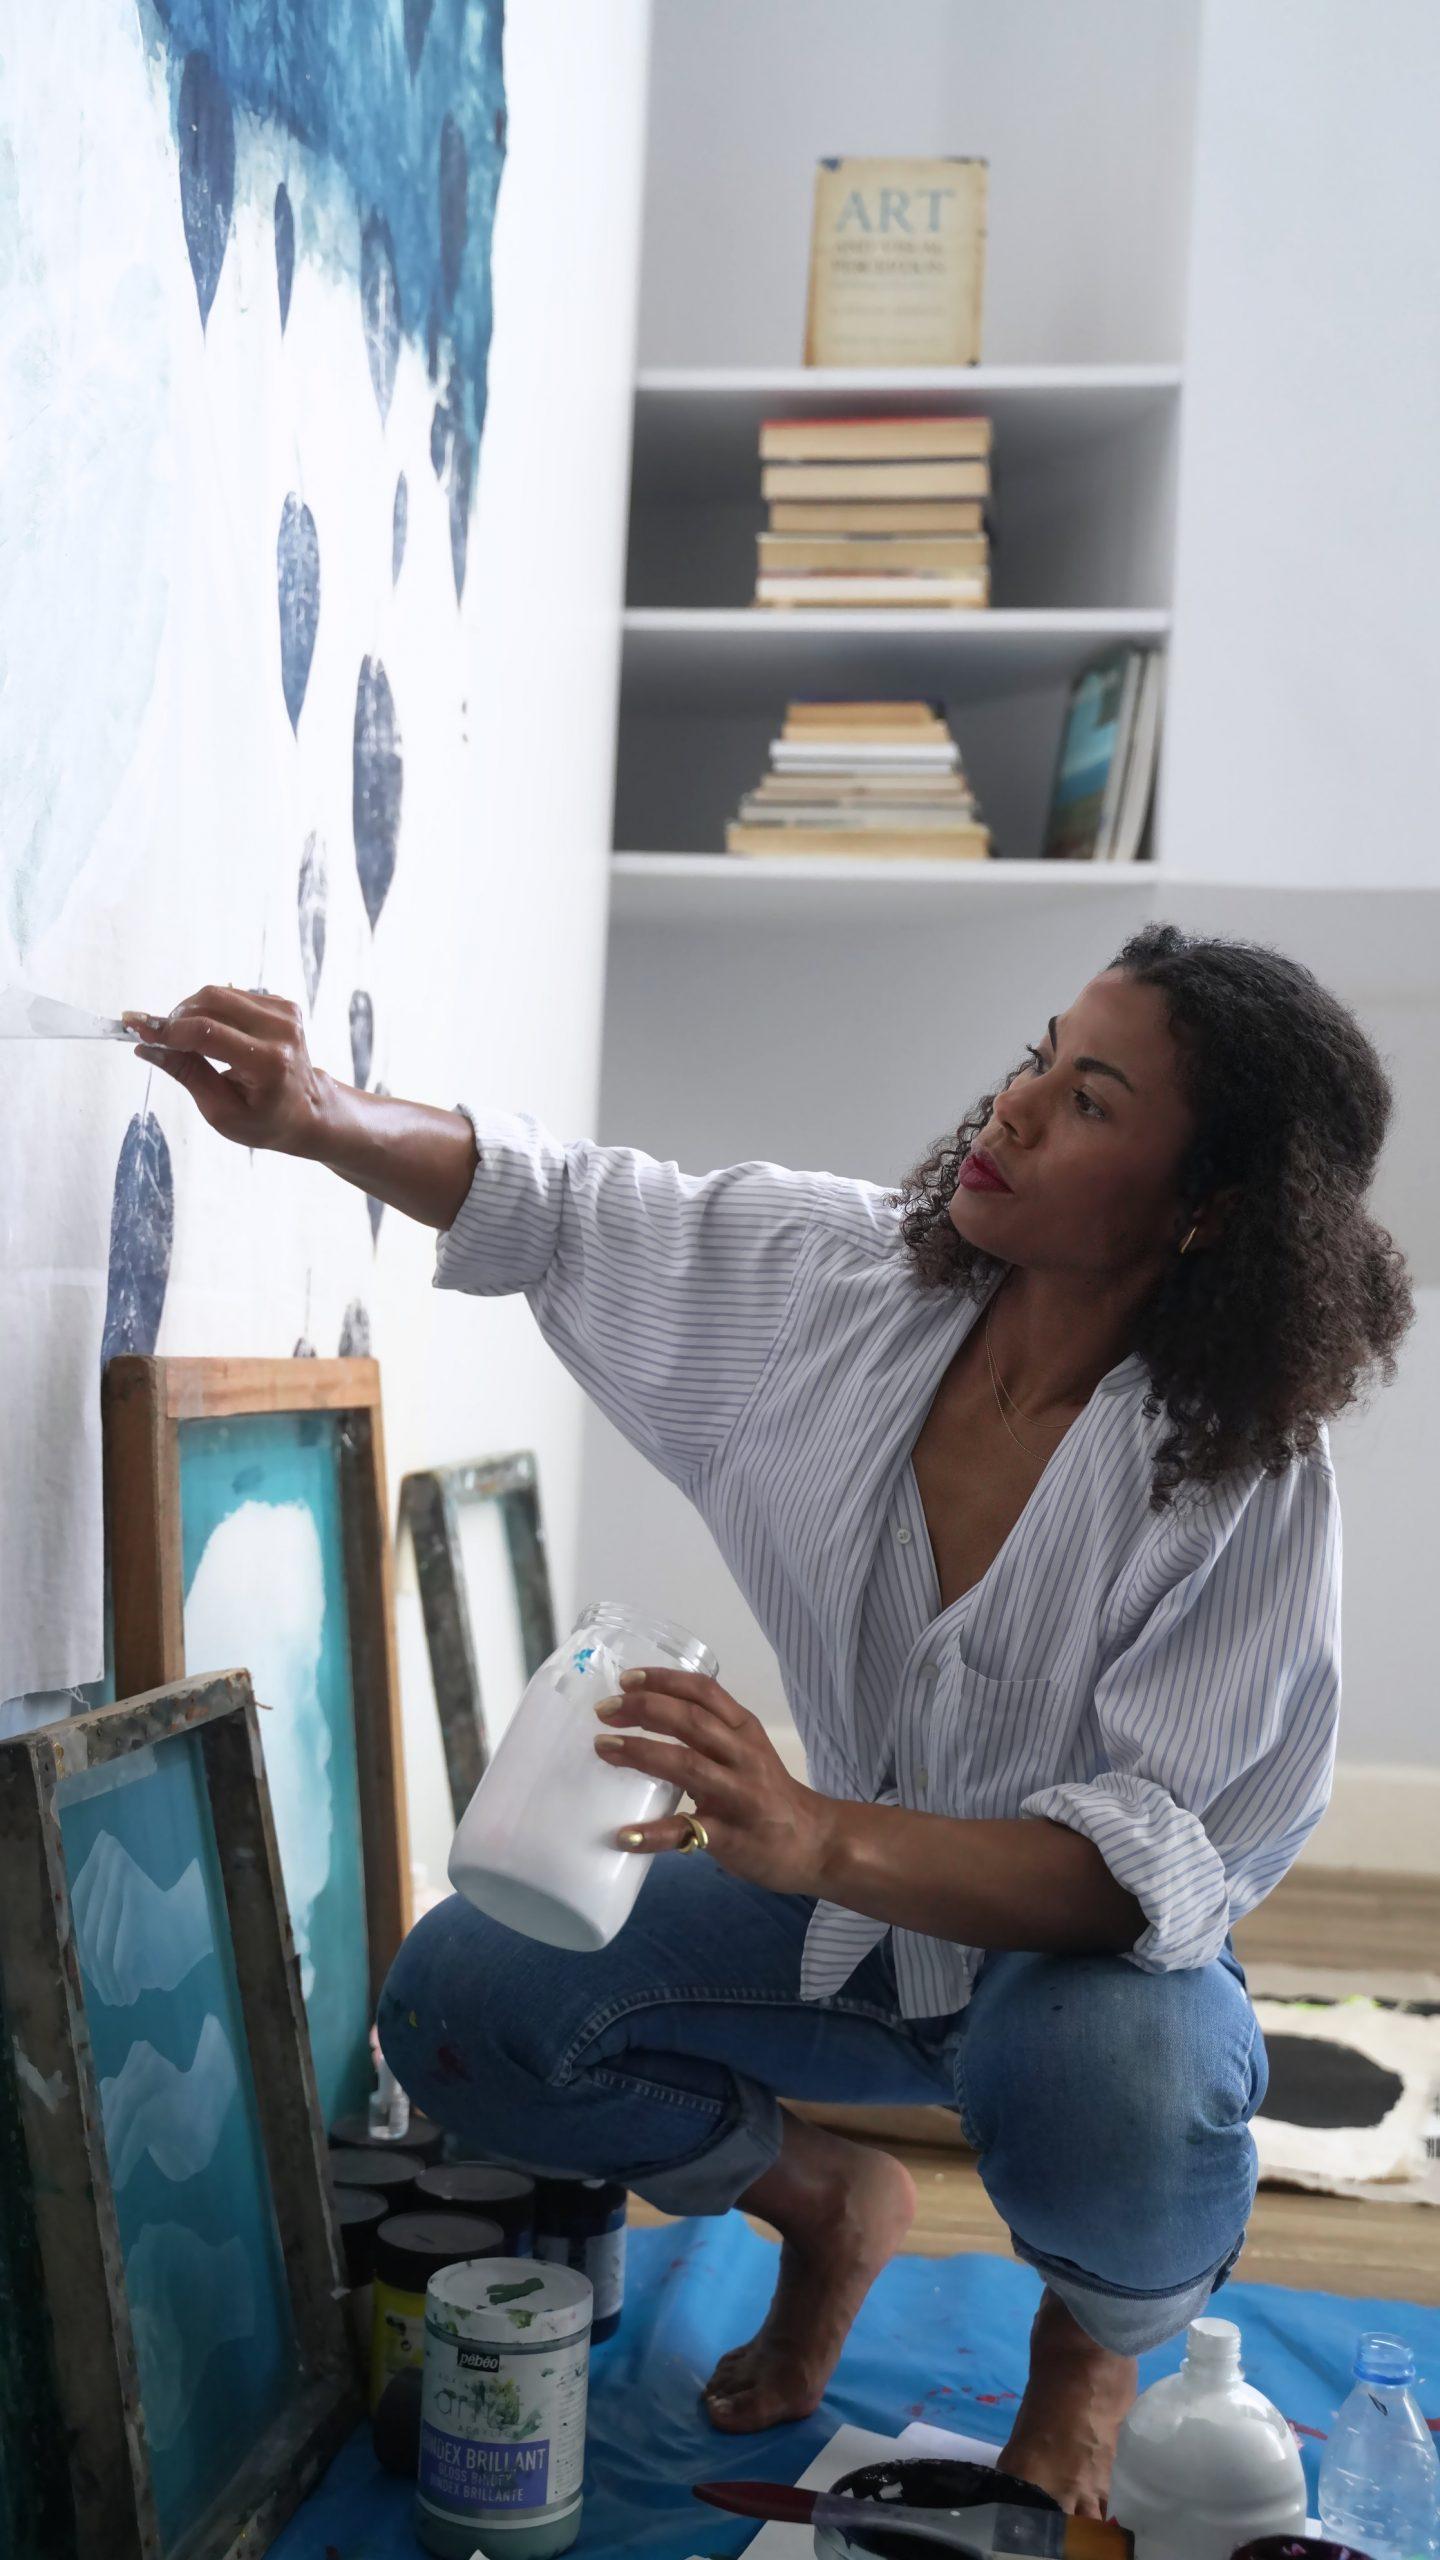 Zohra Opoku at work in her studio at Black Rock Senegal. Photo courtesy of the artist & Mariane Ibrahim Gallery